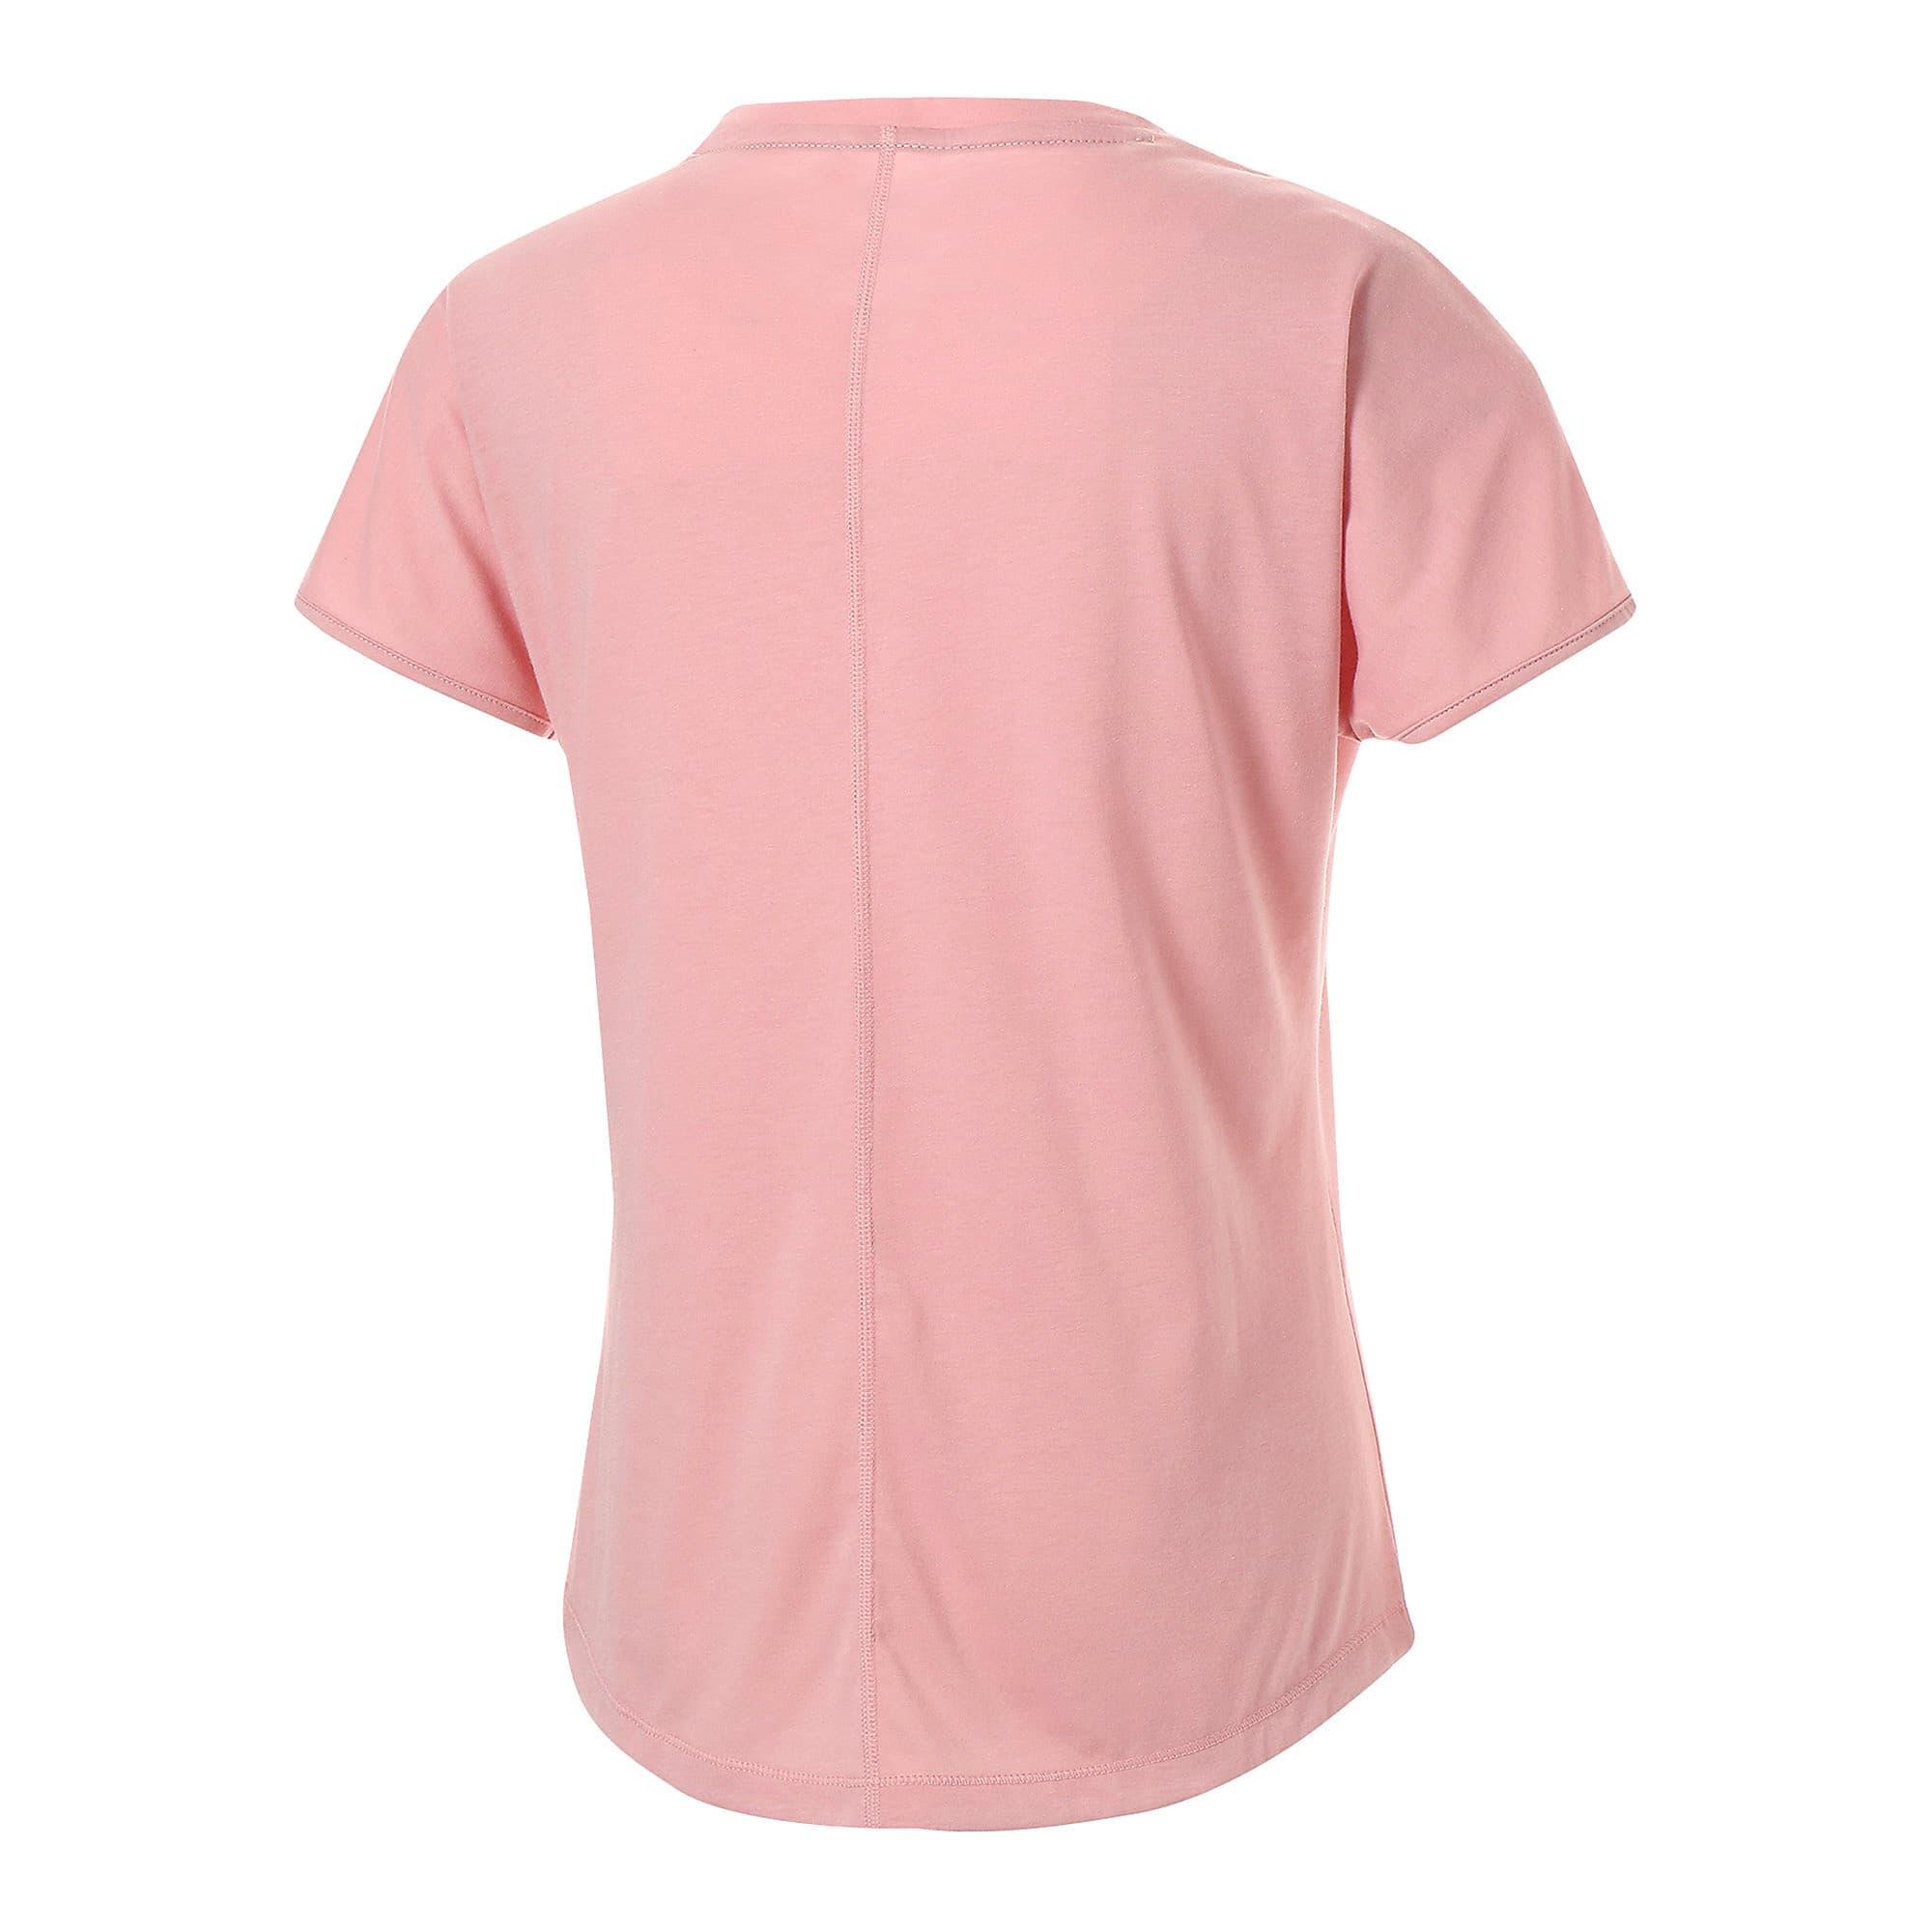 Thumbnail 6 of FAVORITE キャット SS ウィメンズ トレーニング Tシャツ 半袖, Bridal Rose, medium-JPN